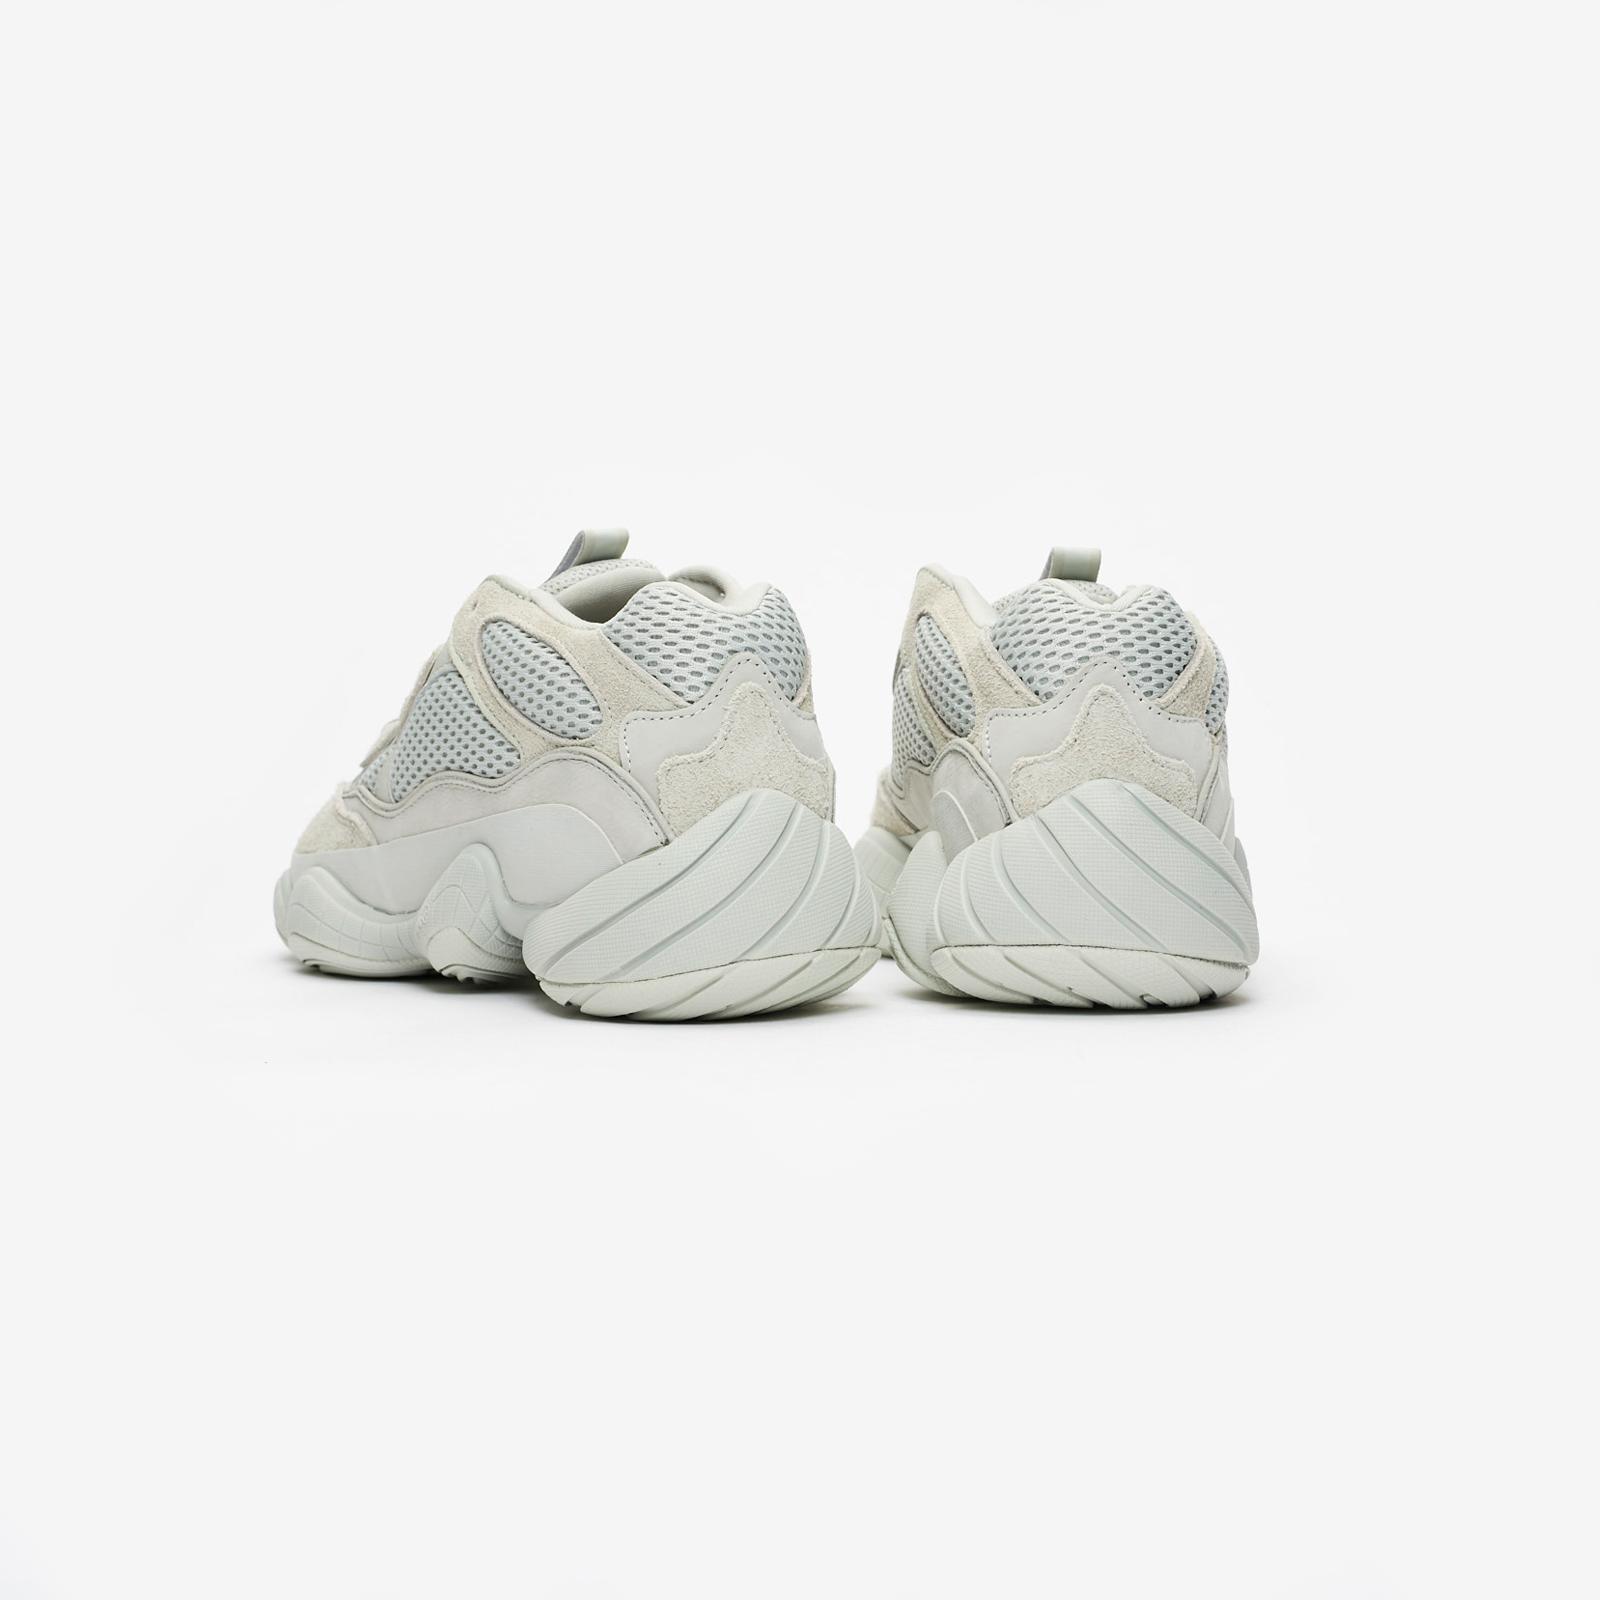 7a041c4b86a ... adidas Originals x Kanye West Yeezy 500 ...